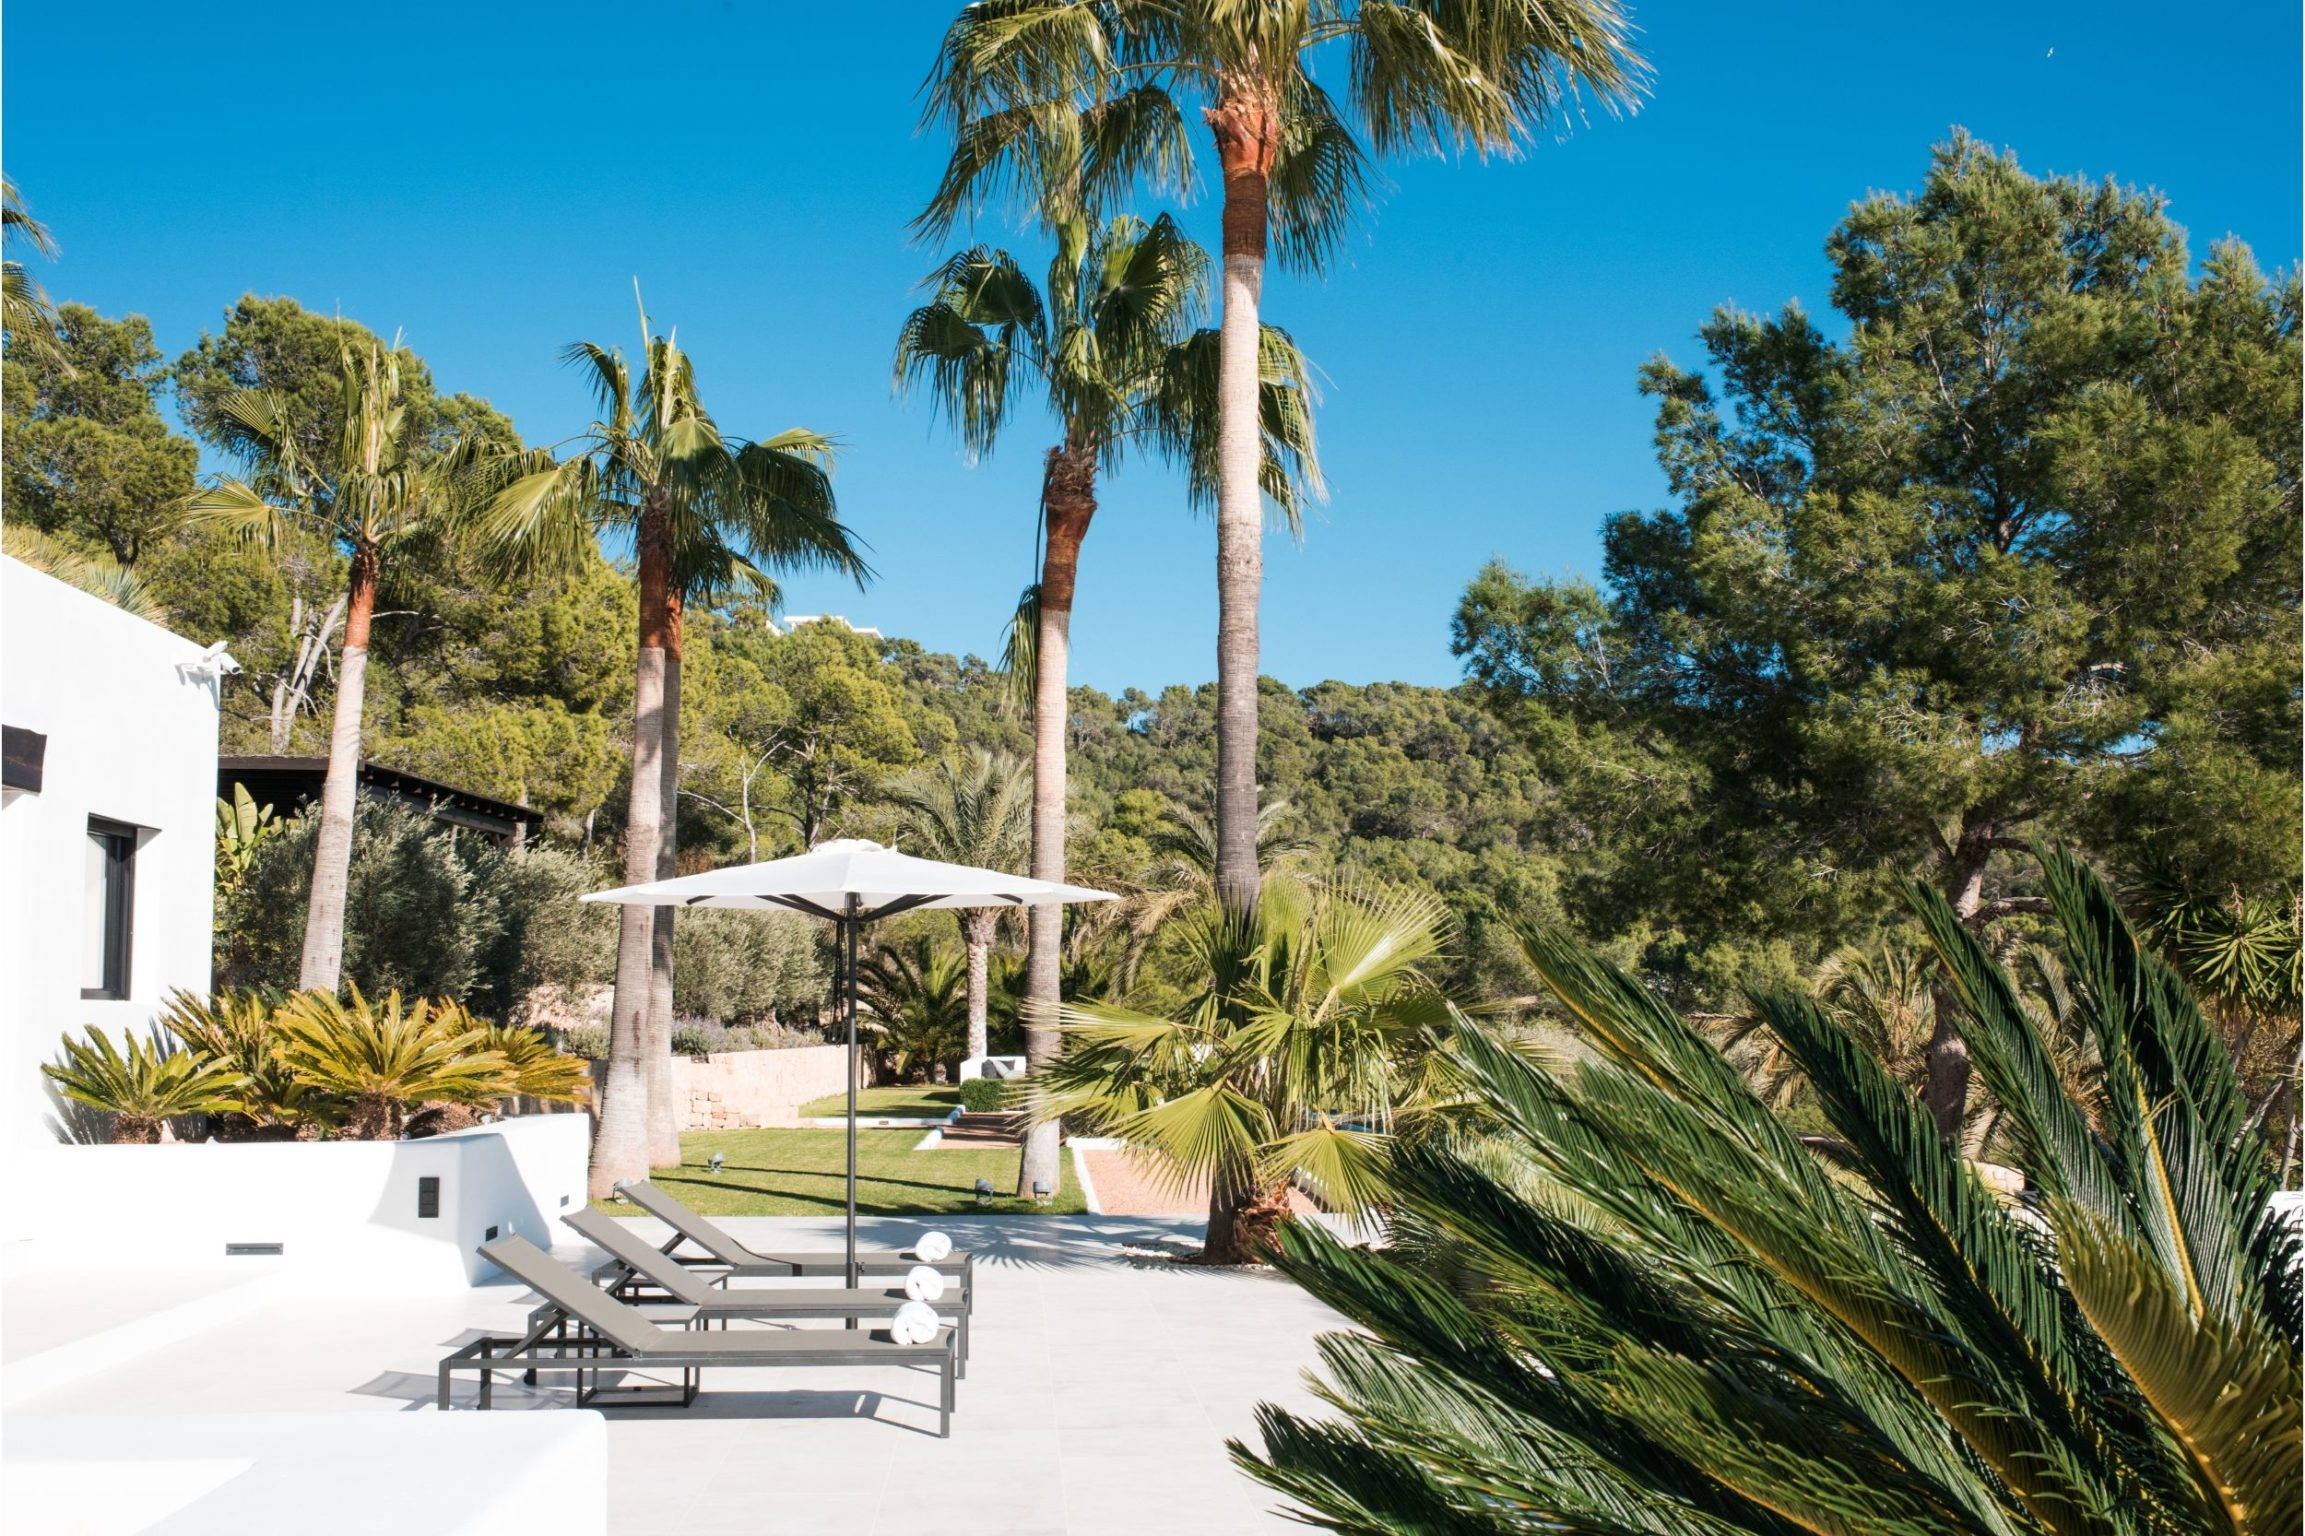 https://www.white-ibiza.com/wp-content/uploads/2020/02/white-ibiza-villas-cap-alvero-outdoors-6-2305x1536.jpg